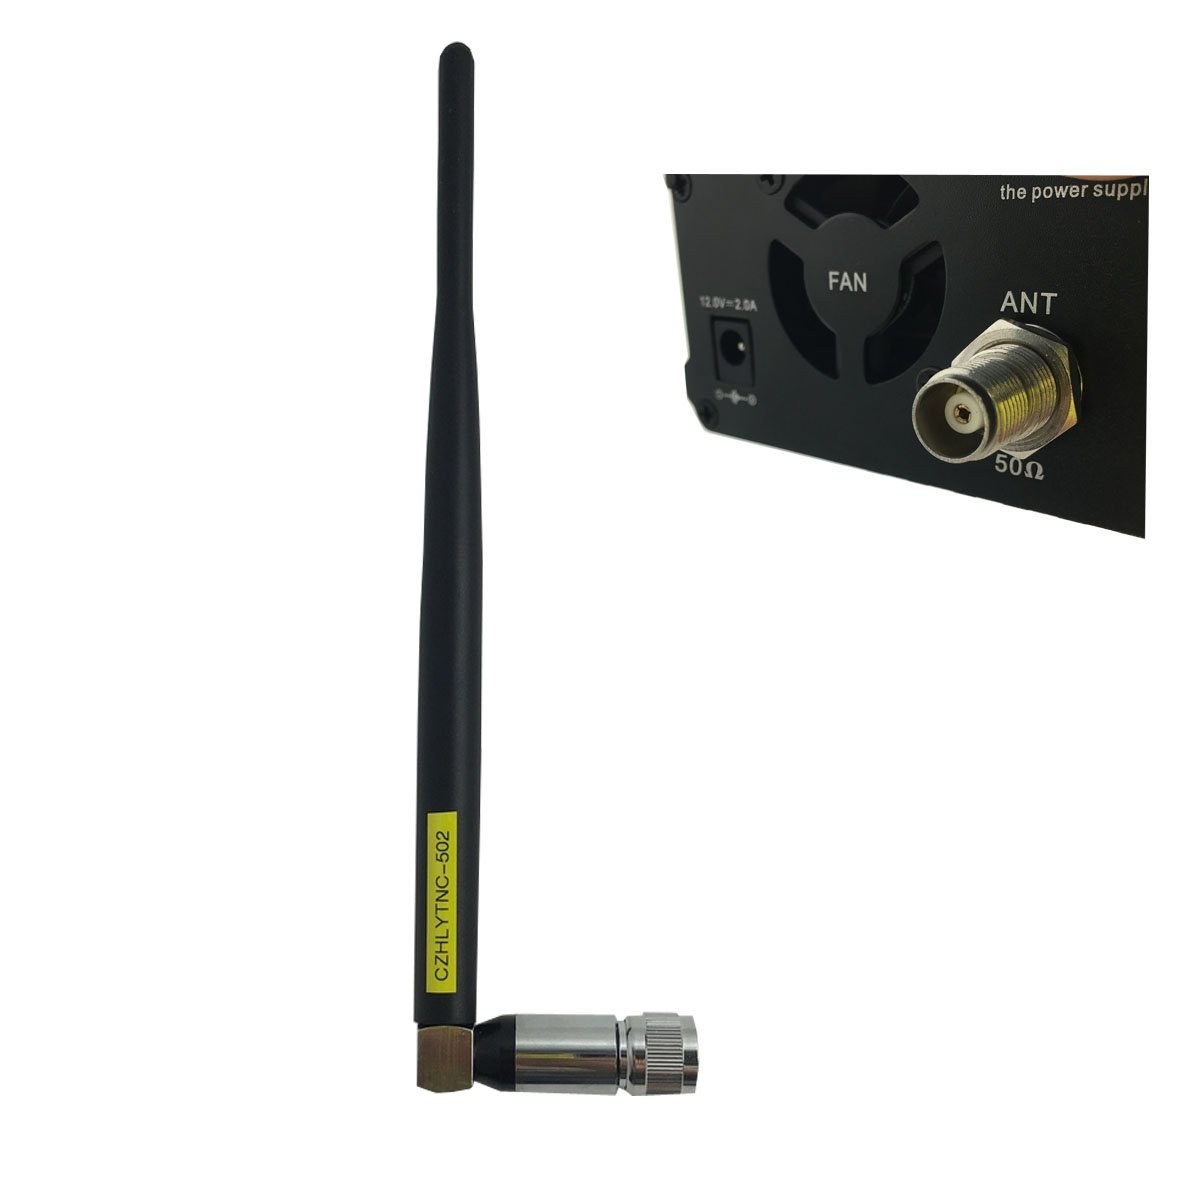 CZH 0.5W CZH-05B//CZE-05B Wireless Long Range Stereo Broadcast FM Transmitter Dual Mode Tnc Antenna Kit